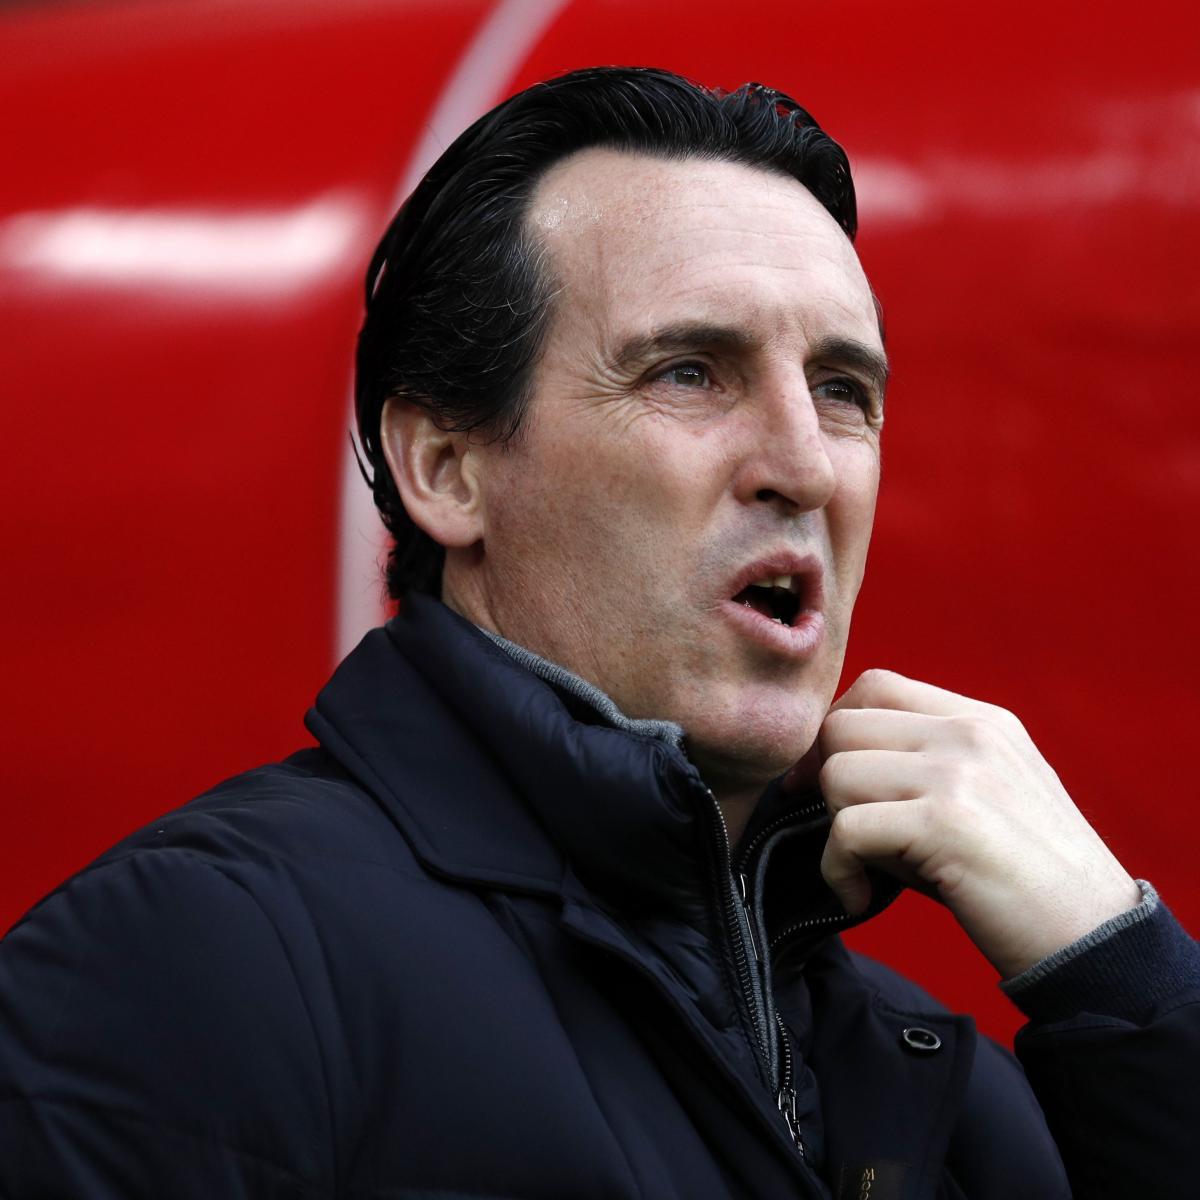 DujsTJqU8AEXhvJ - Unai Emery Reveals Why They Lost To Southampton 3-2